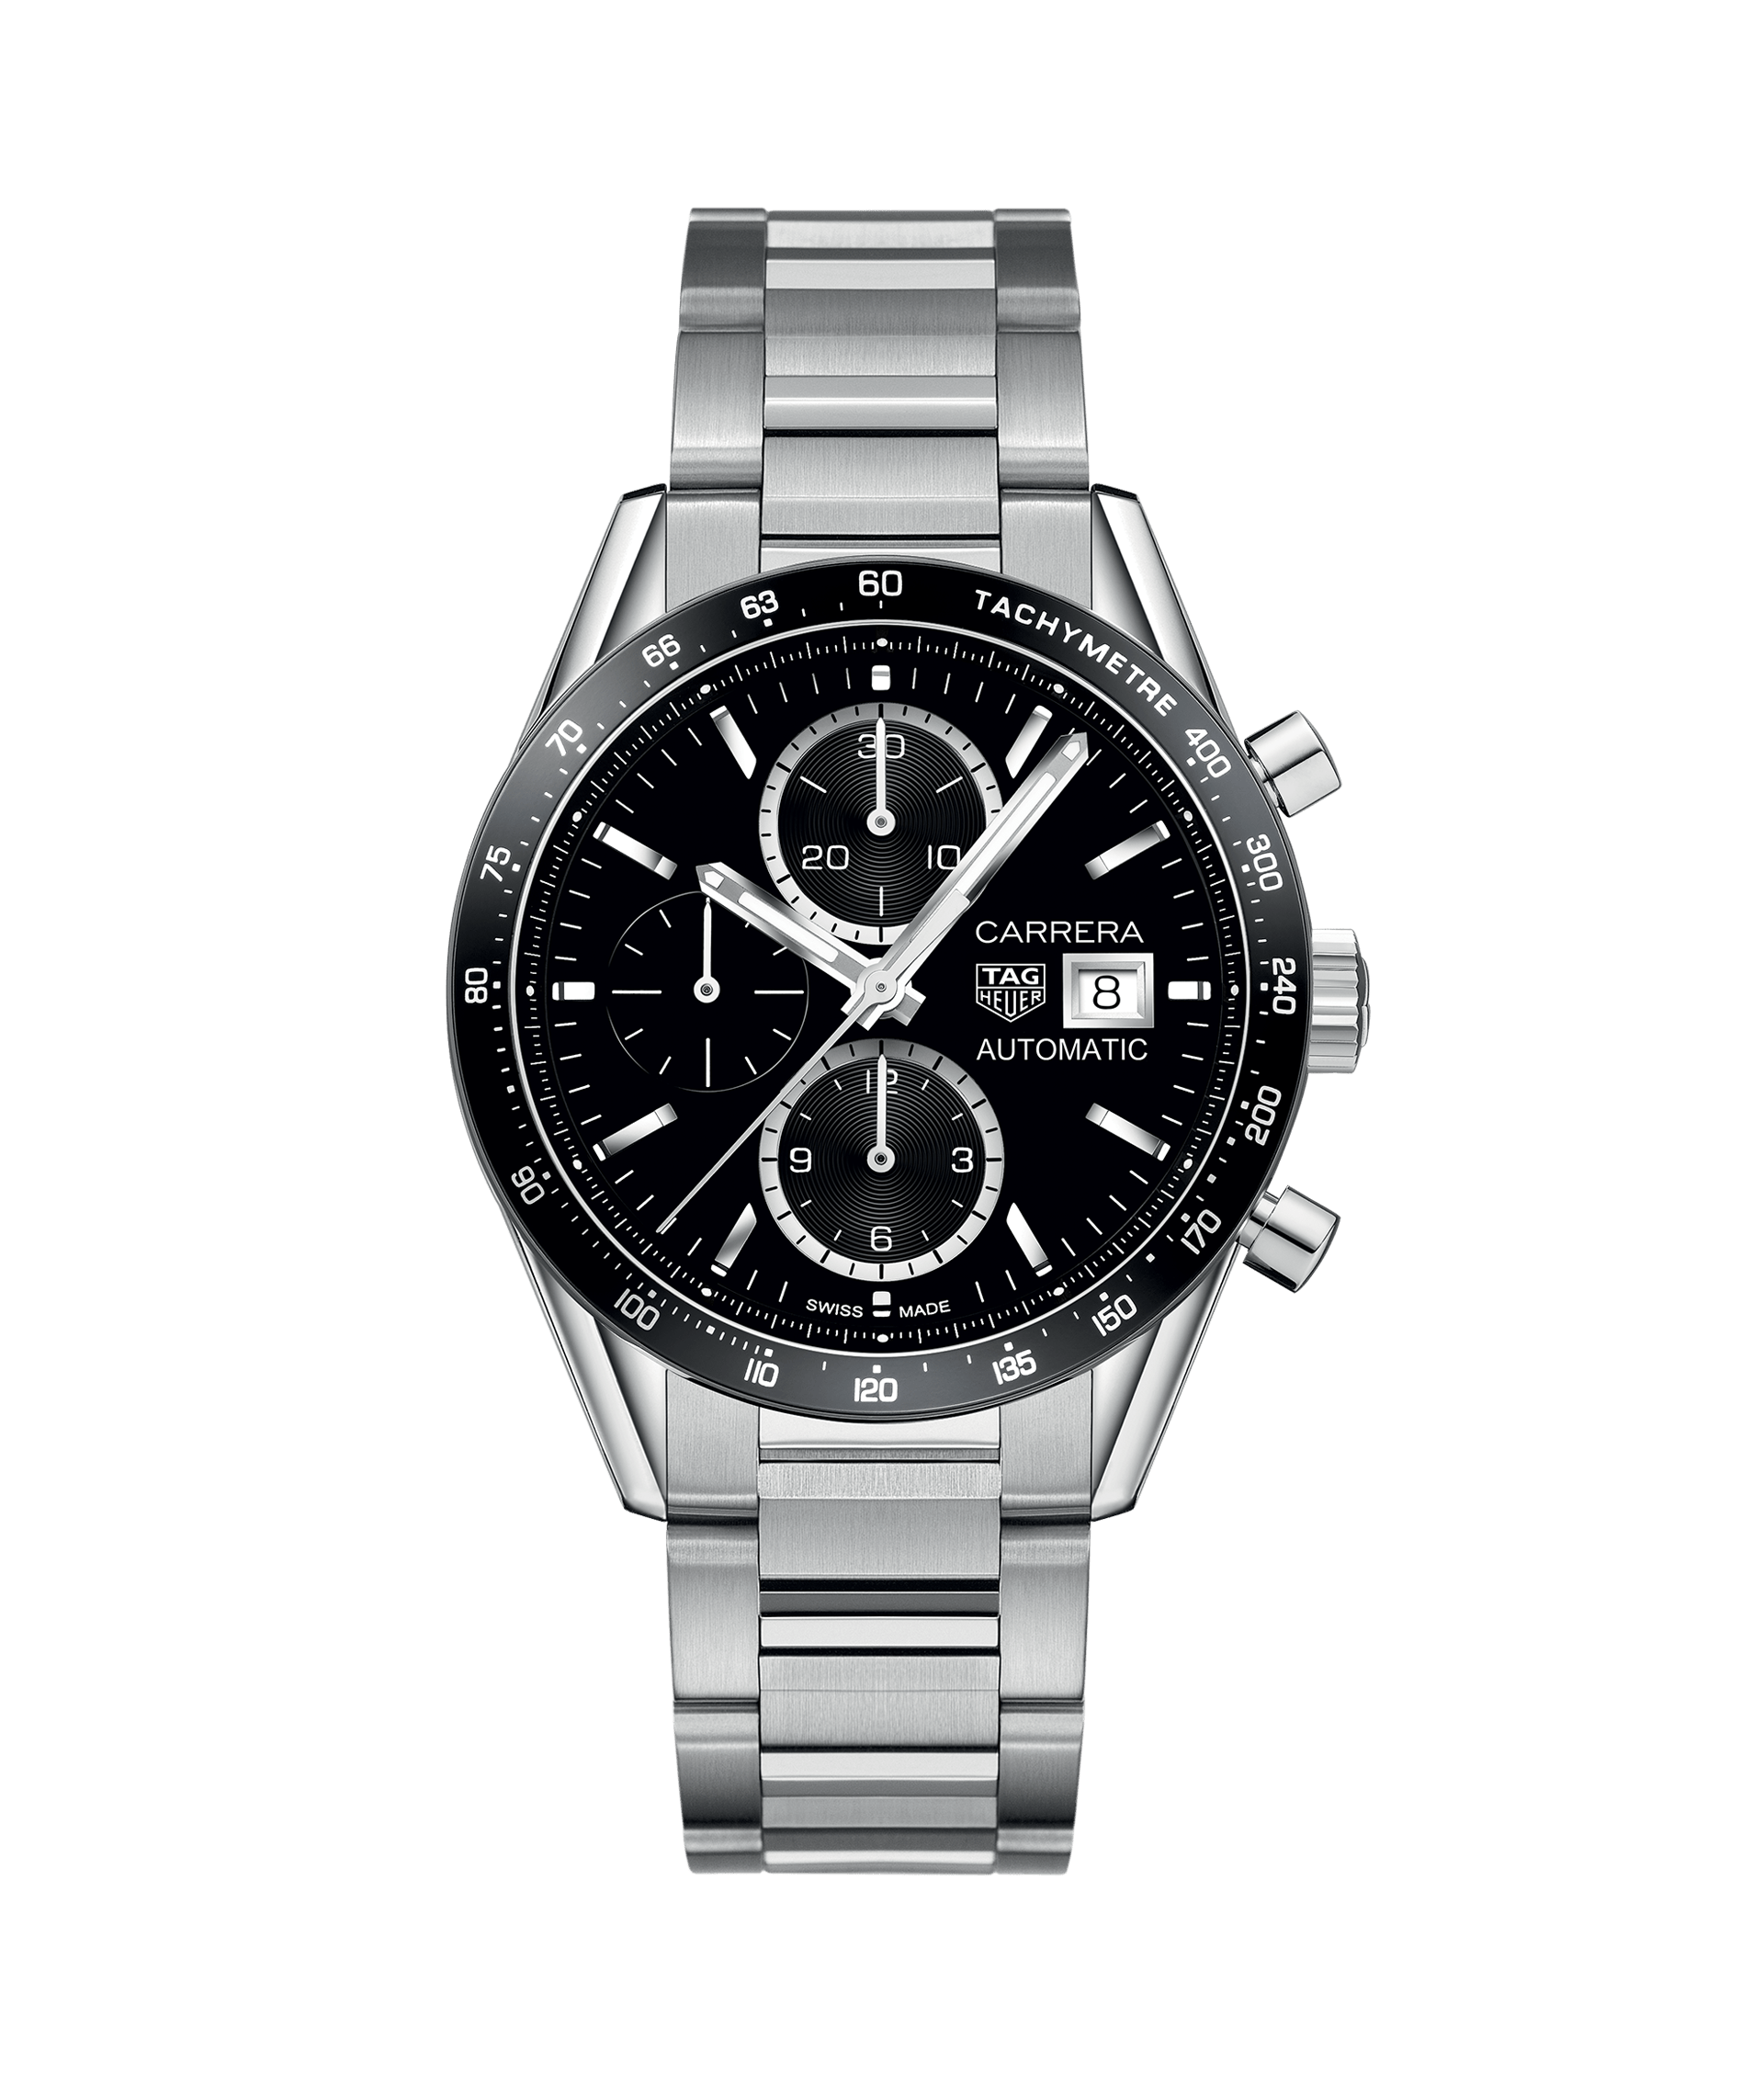 960971f22e00 TAG Heuer Carrera Calibre 16 Automatic Chronograph 100 M - 41 mm  CV201AJ.BA0727 TAG Heuer watch price